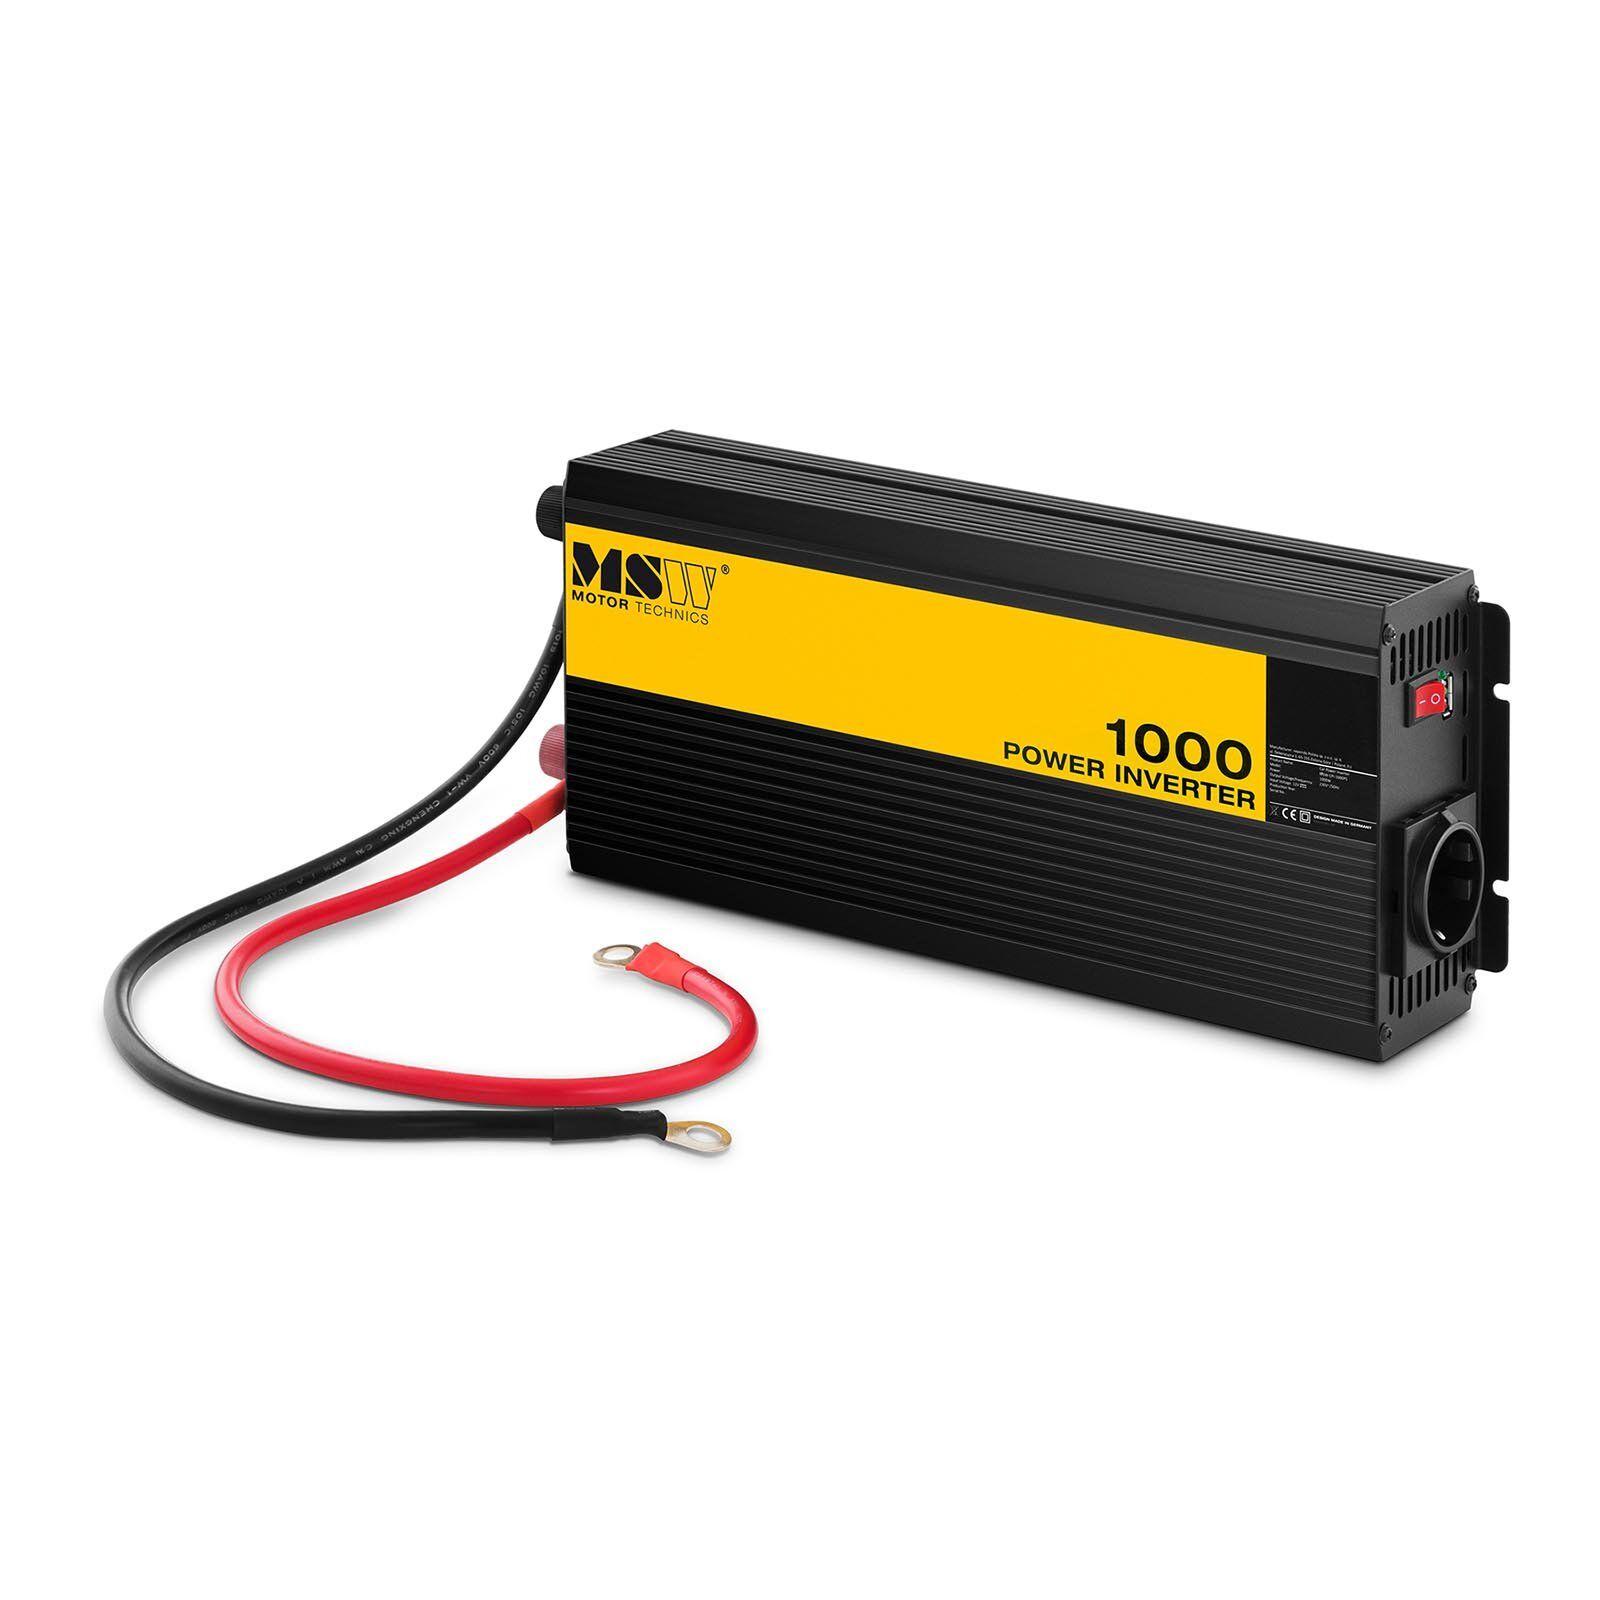 MSW Power inverter - Pure Sine - 1000 W MSW-CPI-1000PS